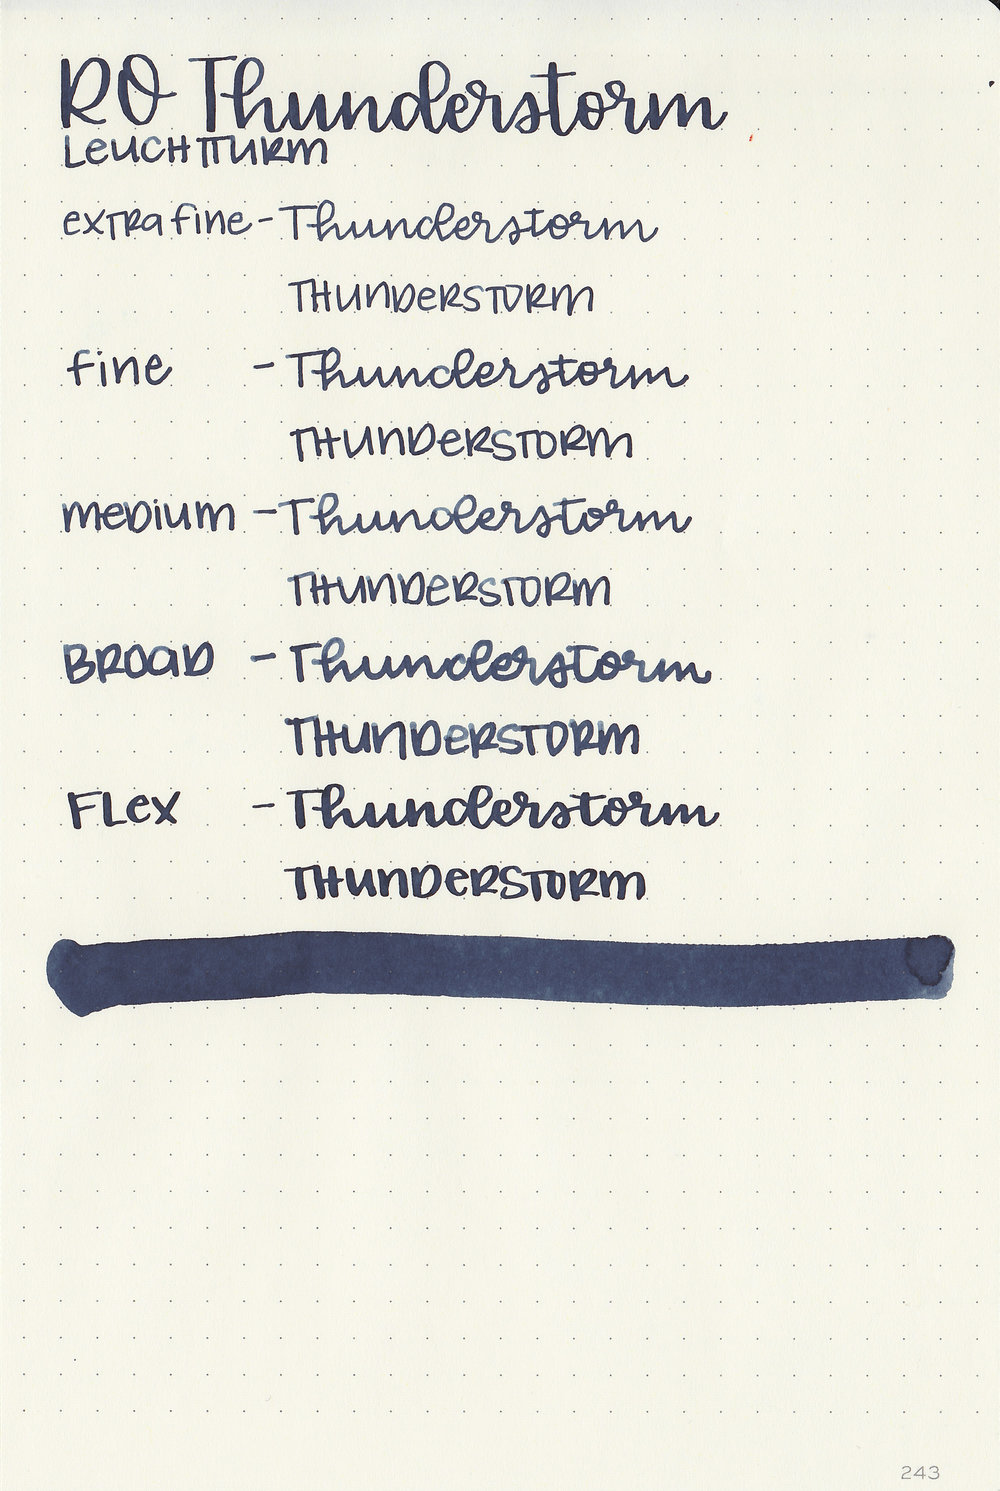 ro-thunderstorm-10.jpg